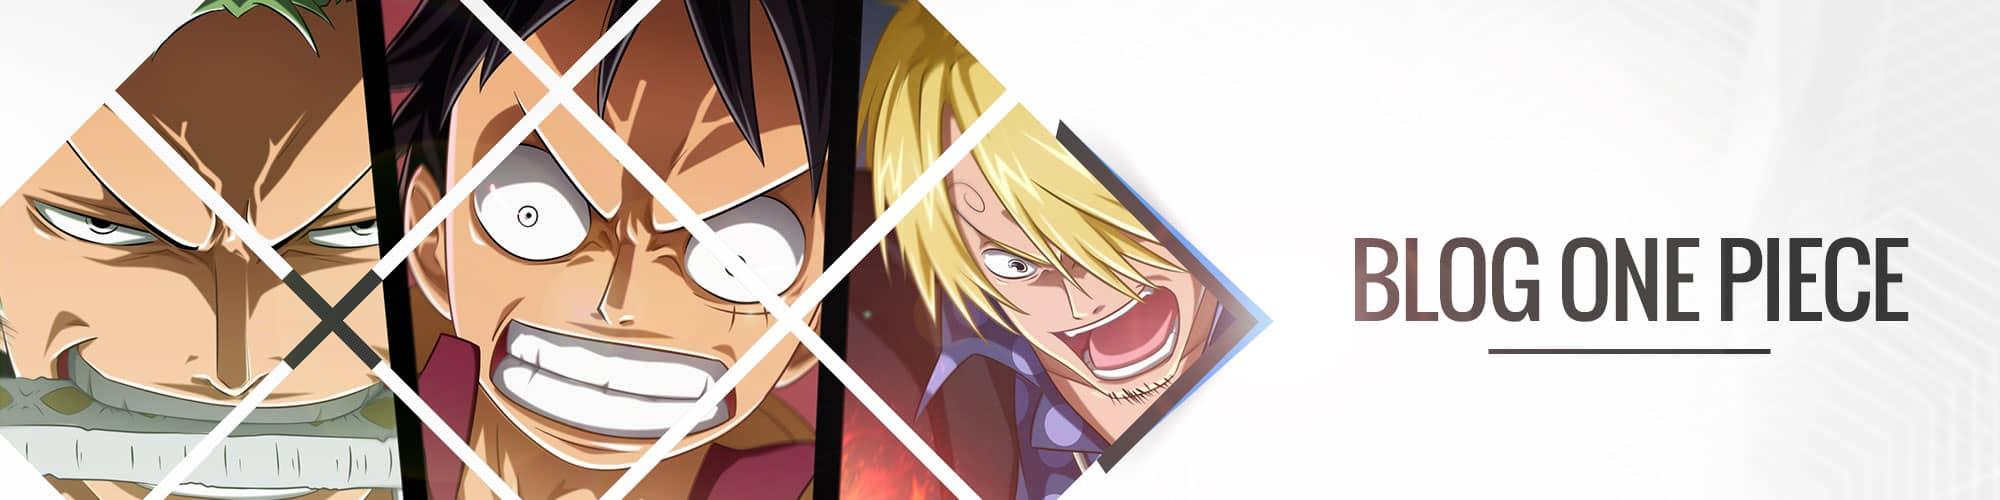 Blog One Piece